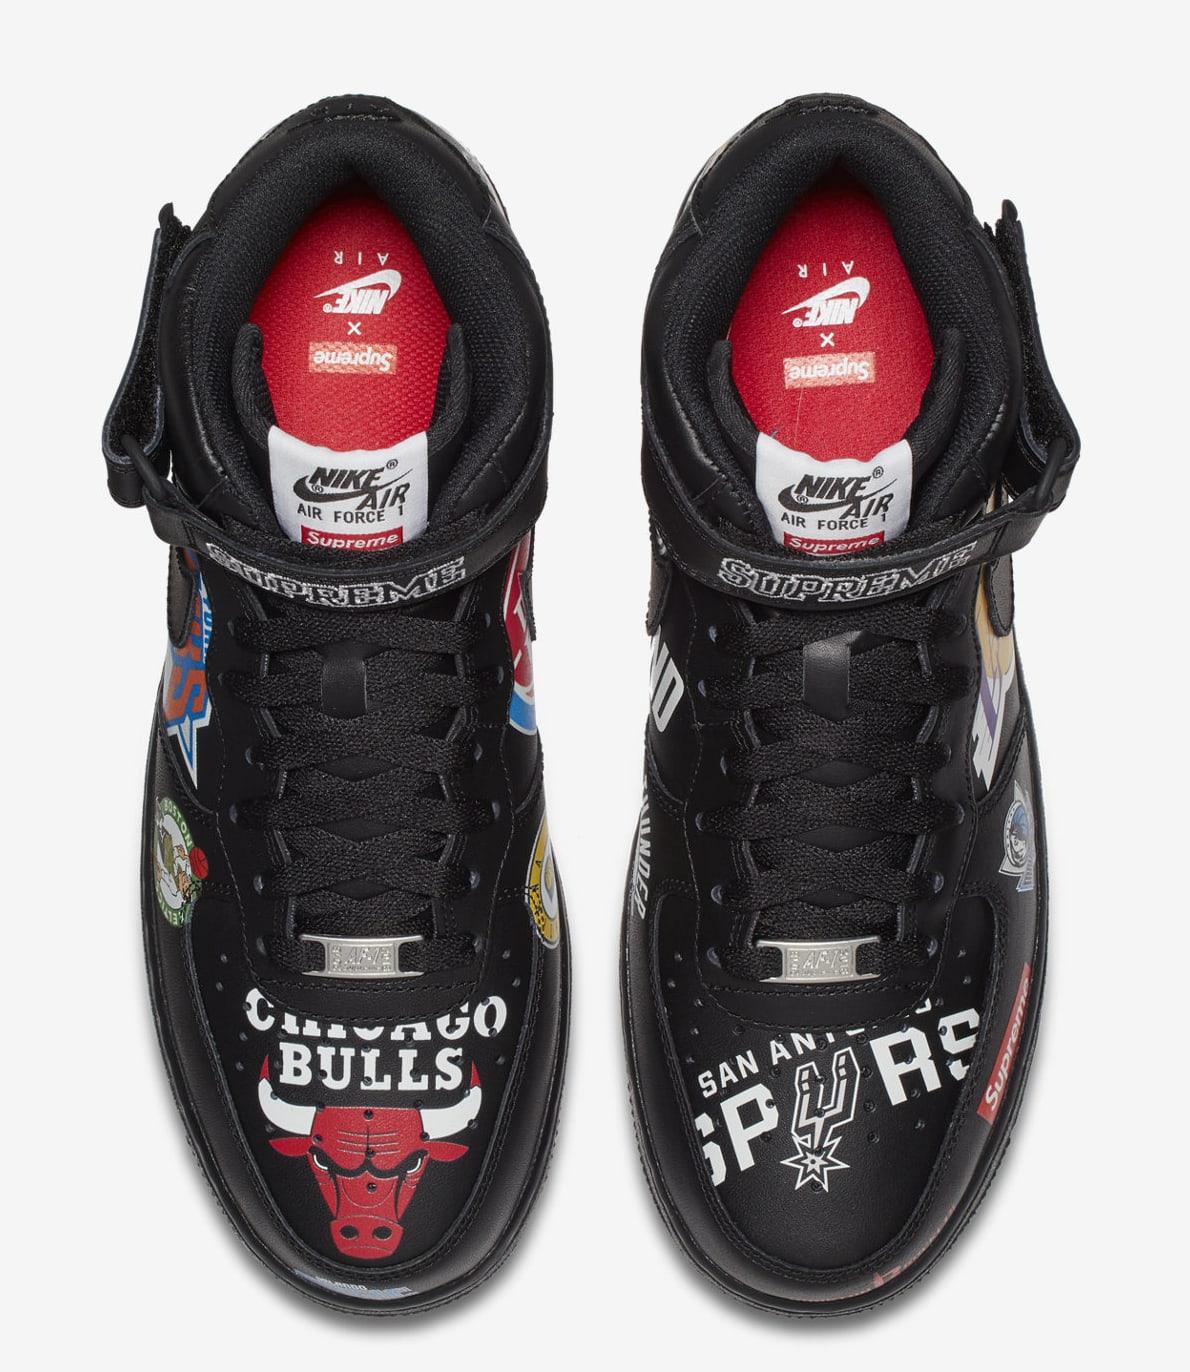 Supreme x NBA x Nike Air Force 1 Mid AQ8017-001 (Top)